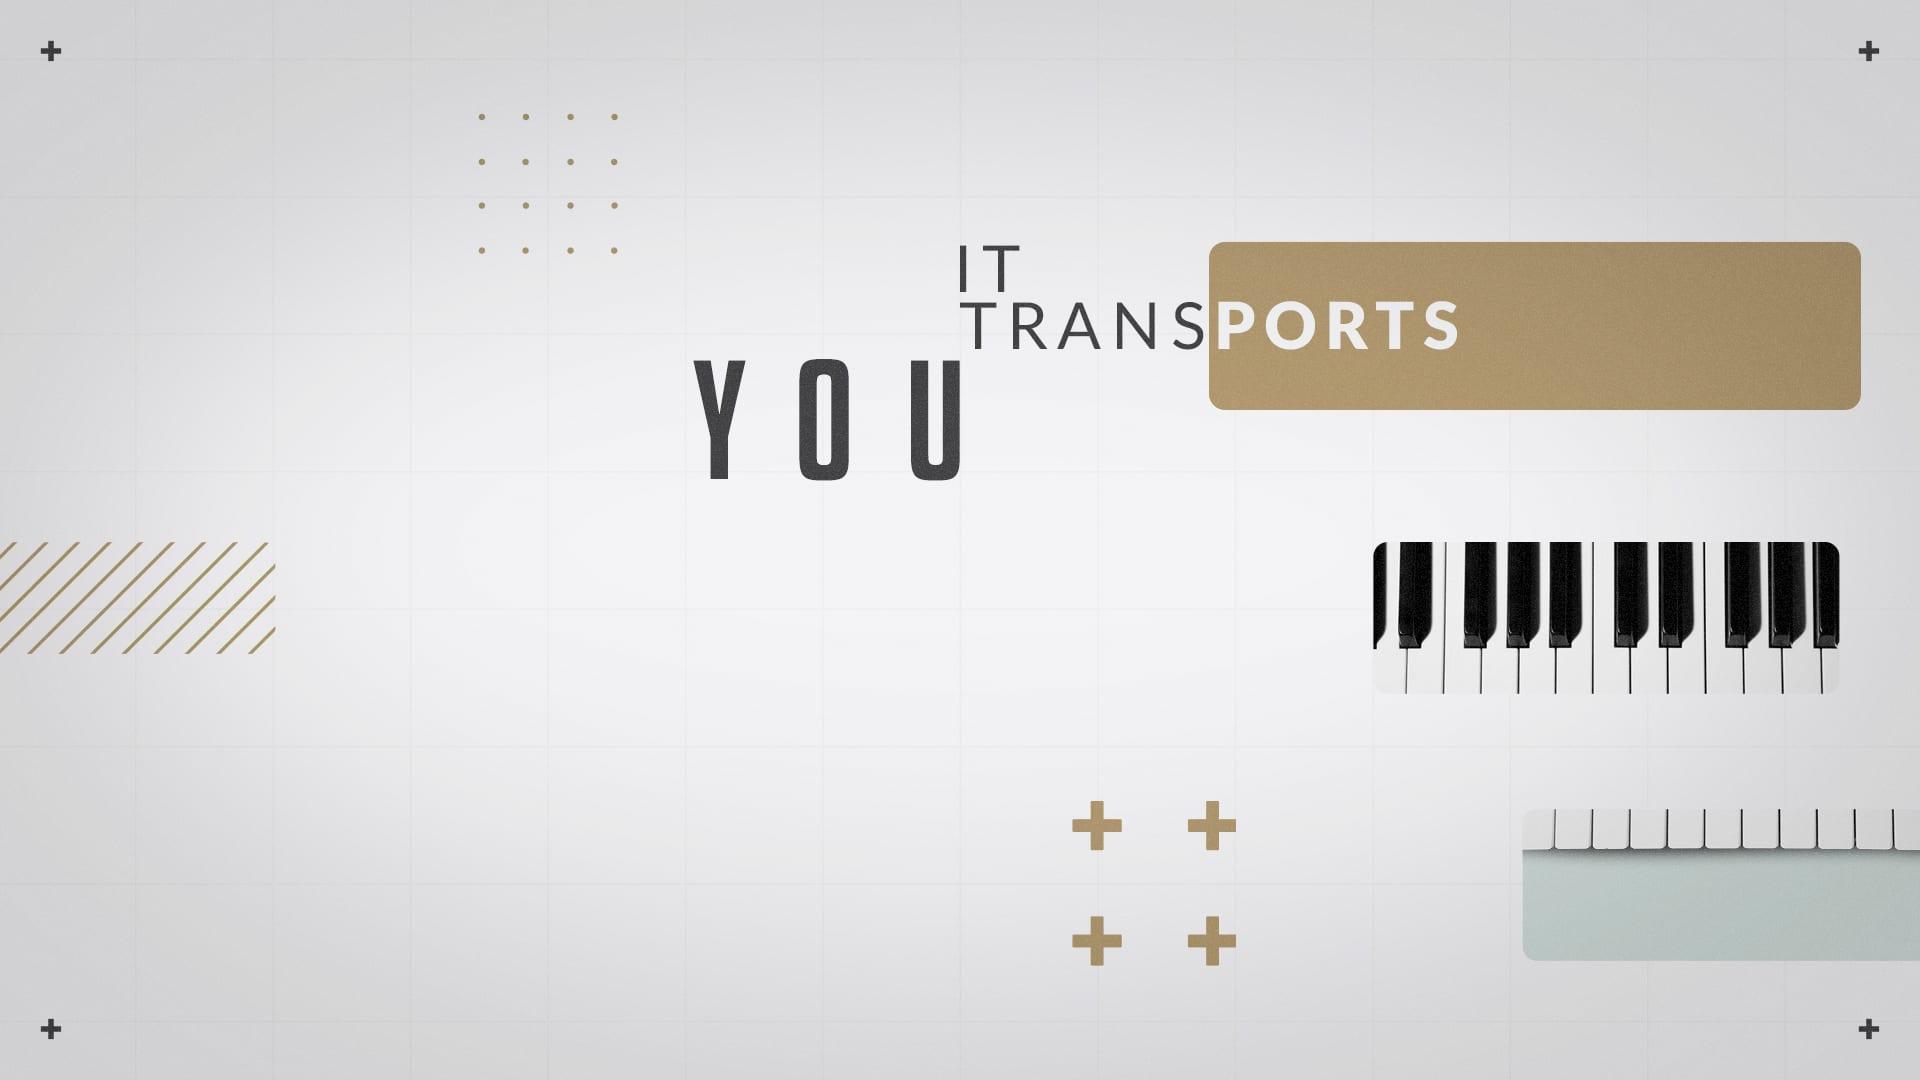 B06 – It transports you